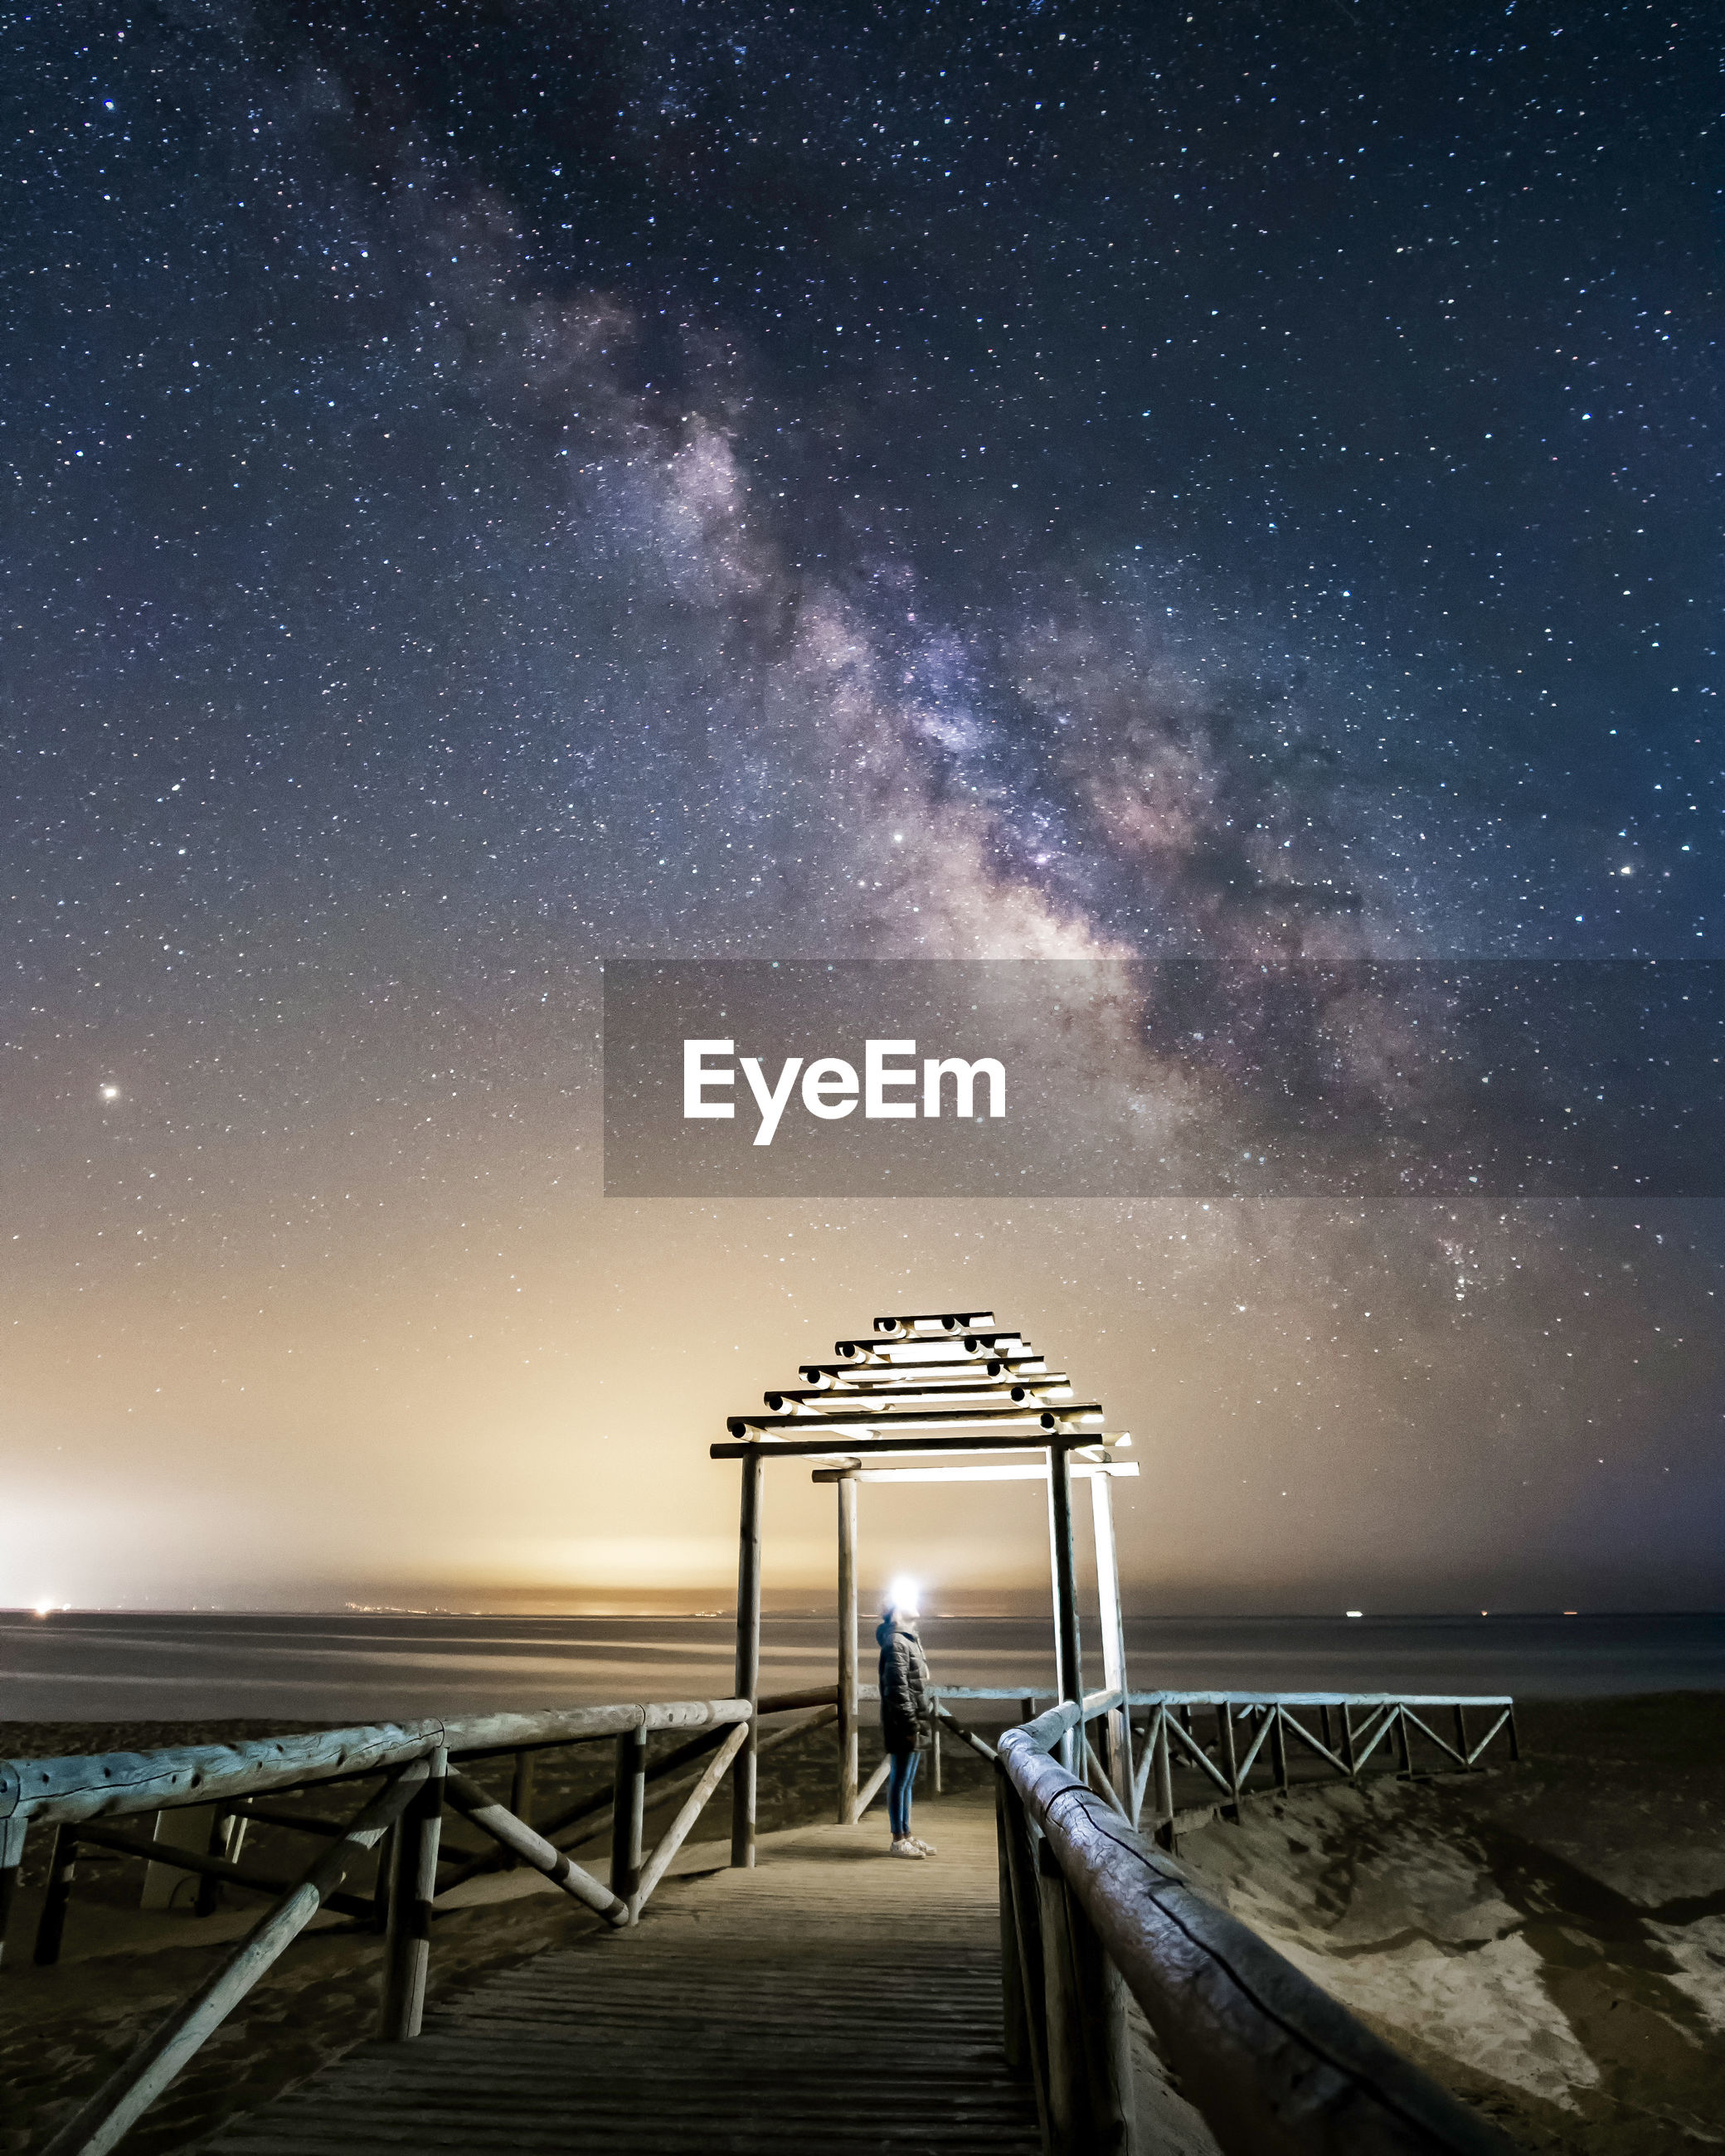 GAZEBO BY SEA AGAINST SKY AT NIGHT